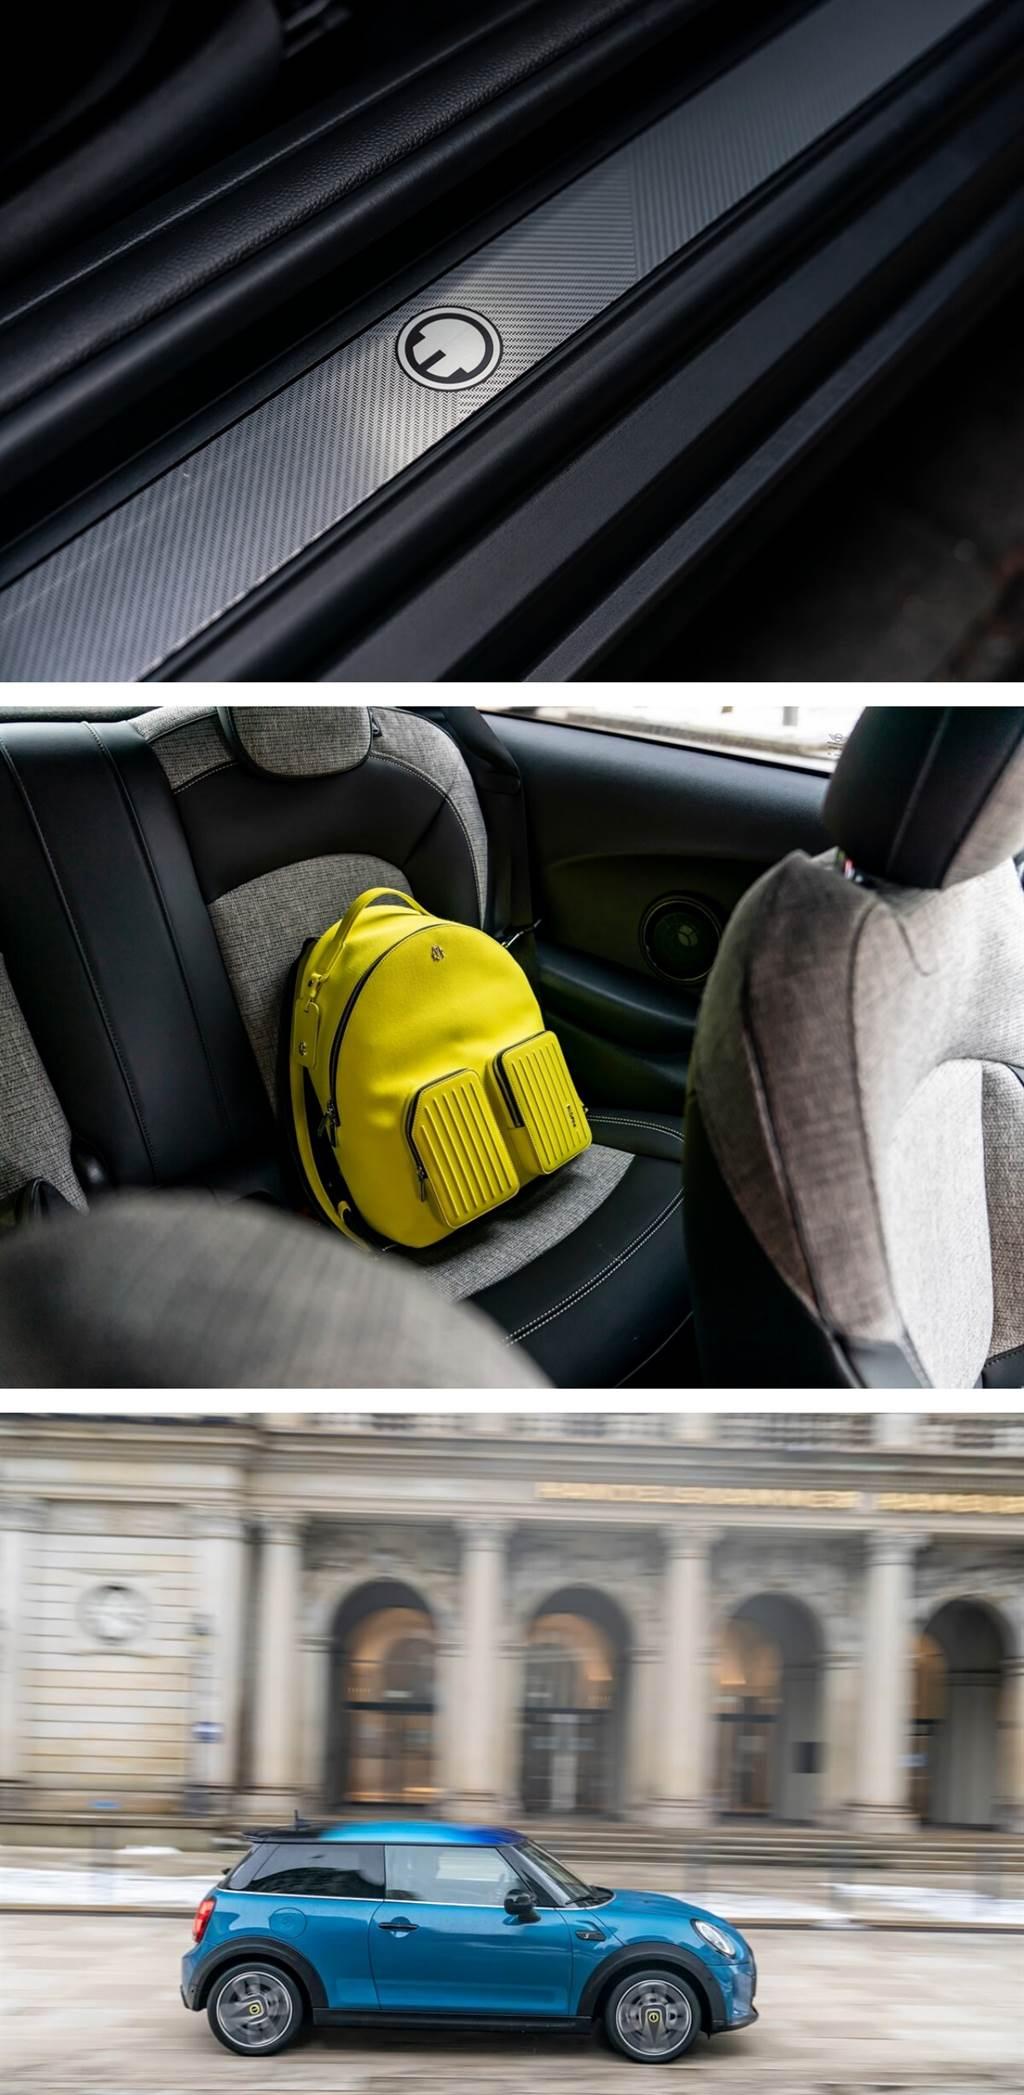 MINI為Cooper SE再添電動駕駛樂趣的獨特新功能和配備